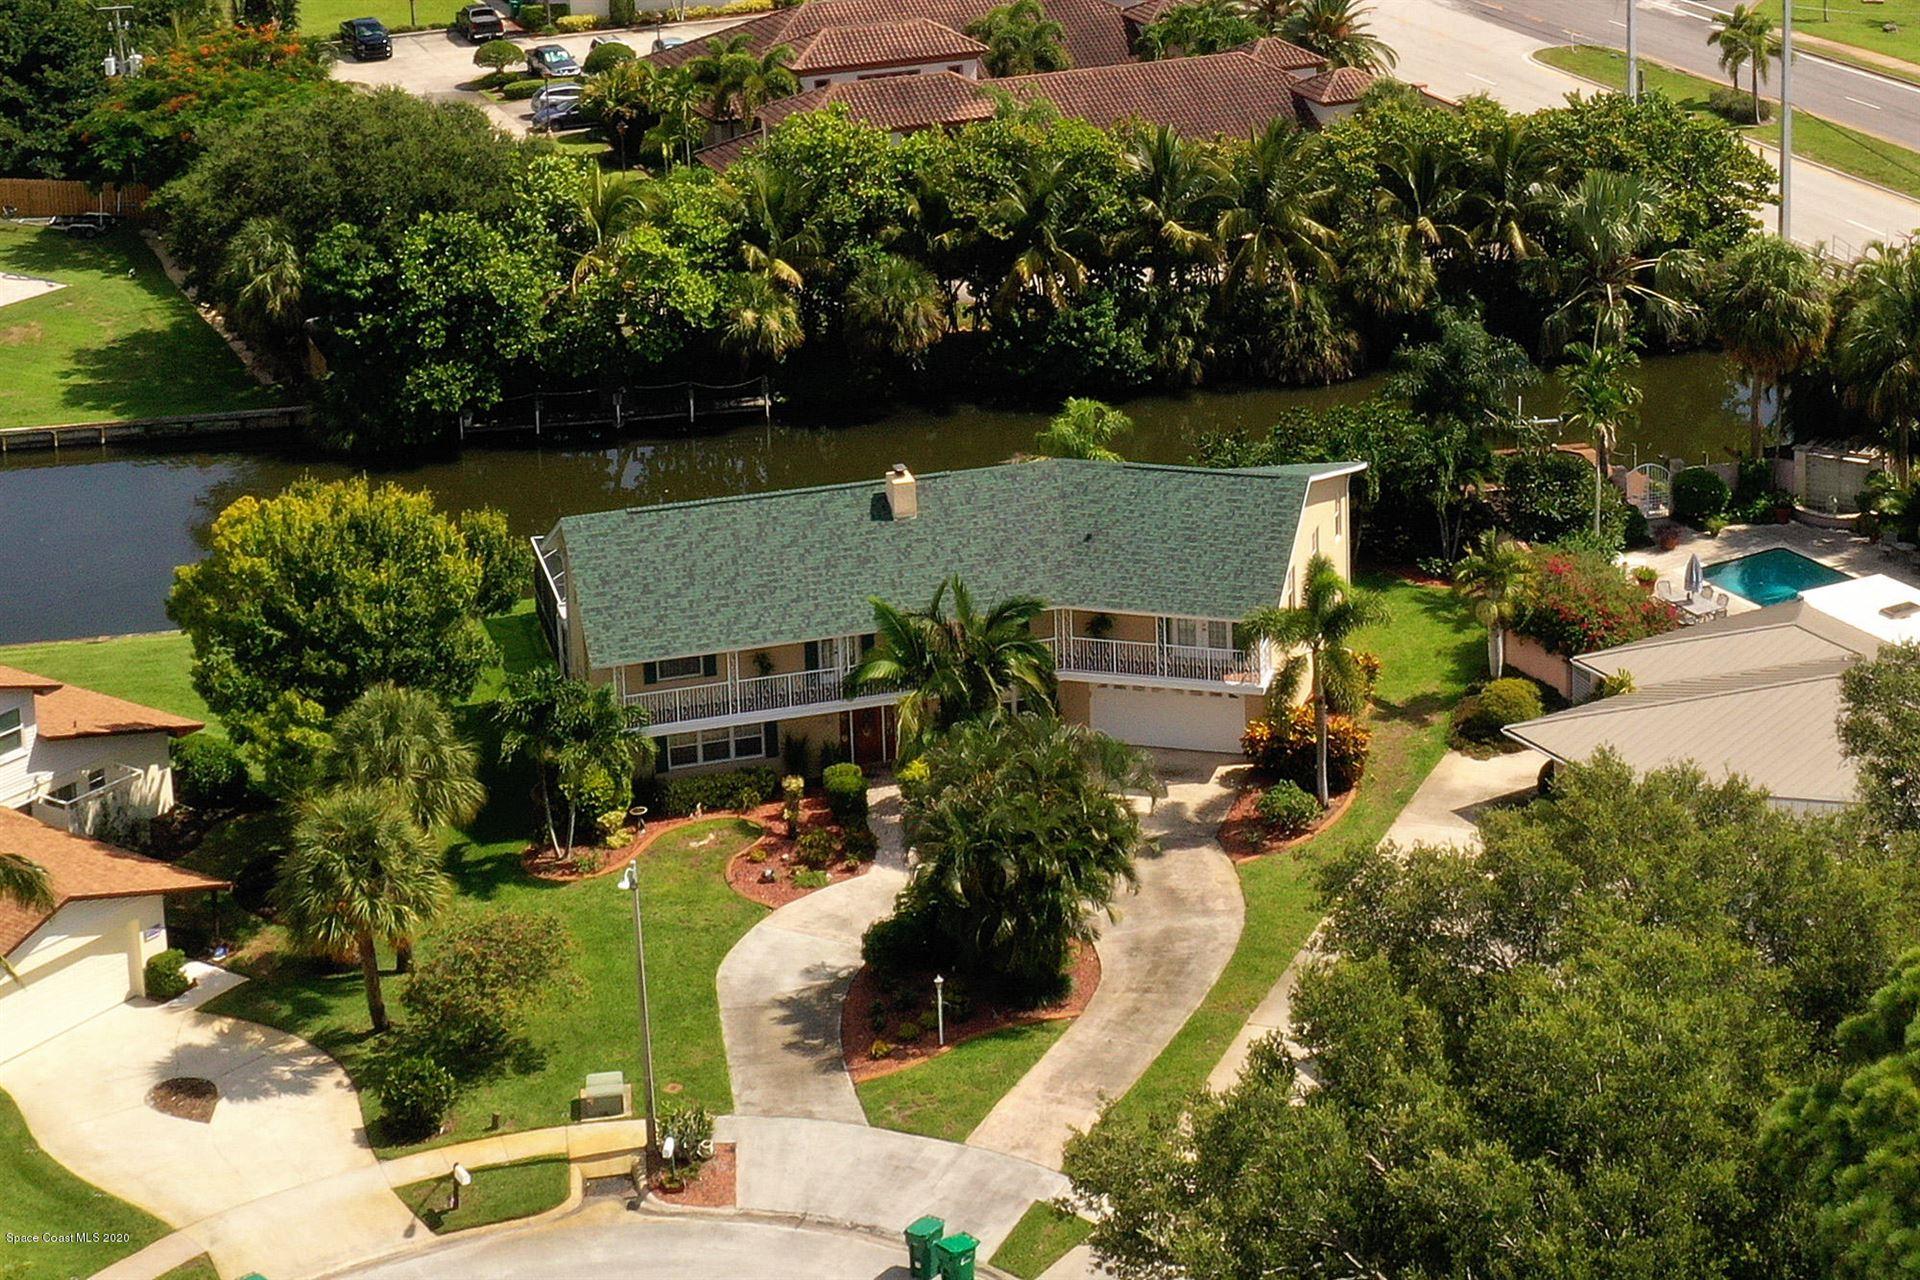 6 Yacht Club Lane, Indian Harbour Beach, FL 32937 - #: 879881